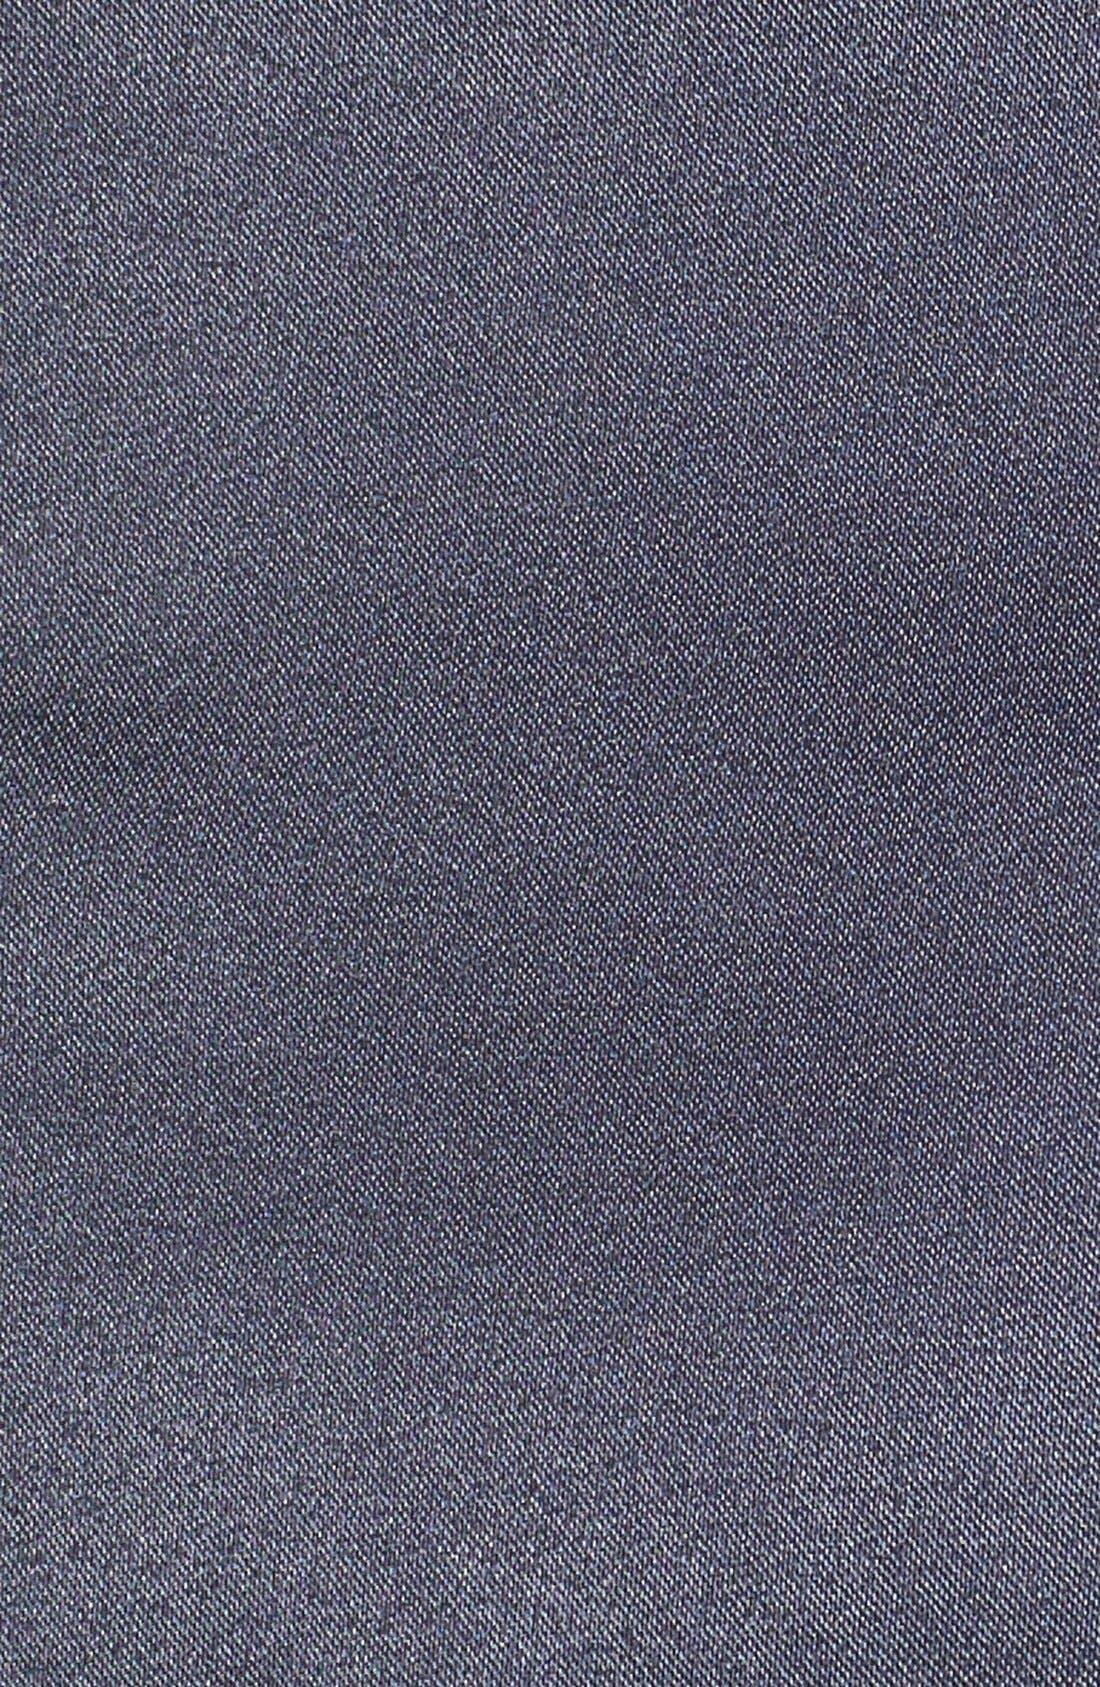 High Waist Satin Shorts,                             Alternate thumbnail 3, color,                             Navy